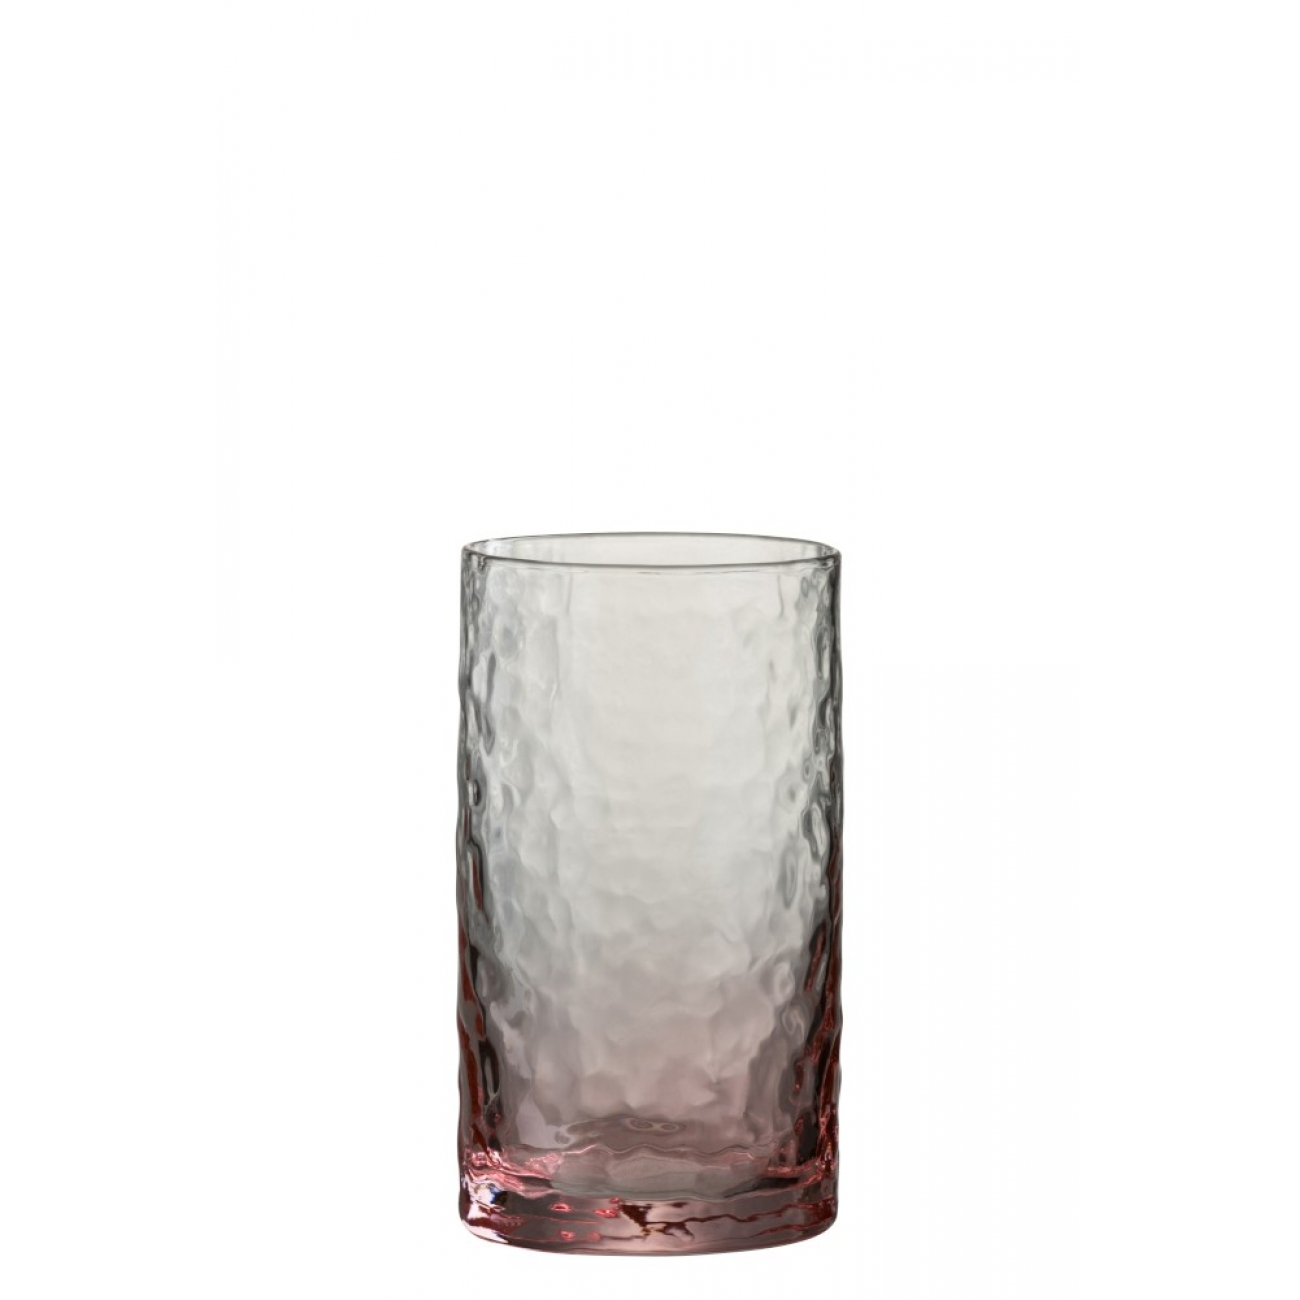 Стакан J-LINE стеклянный розовый  объем 350 мл